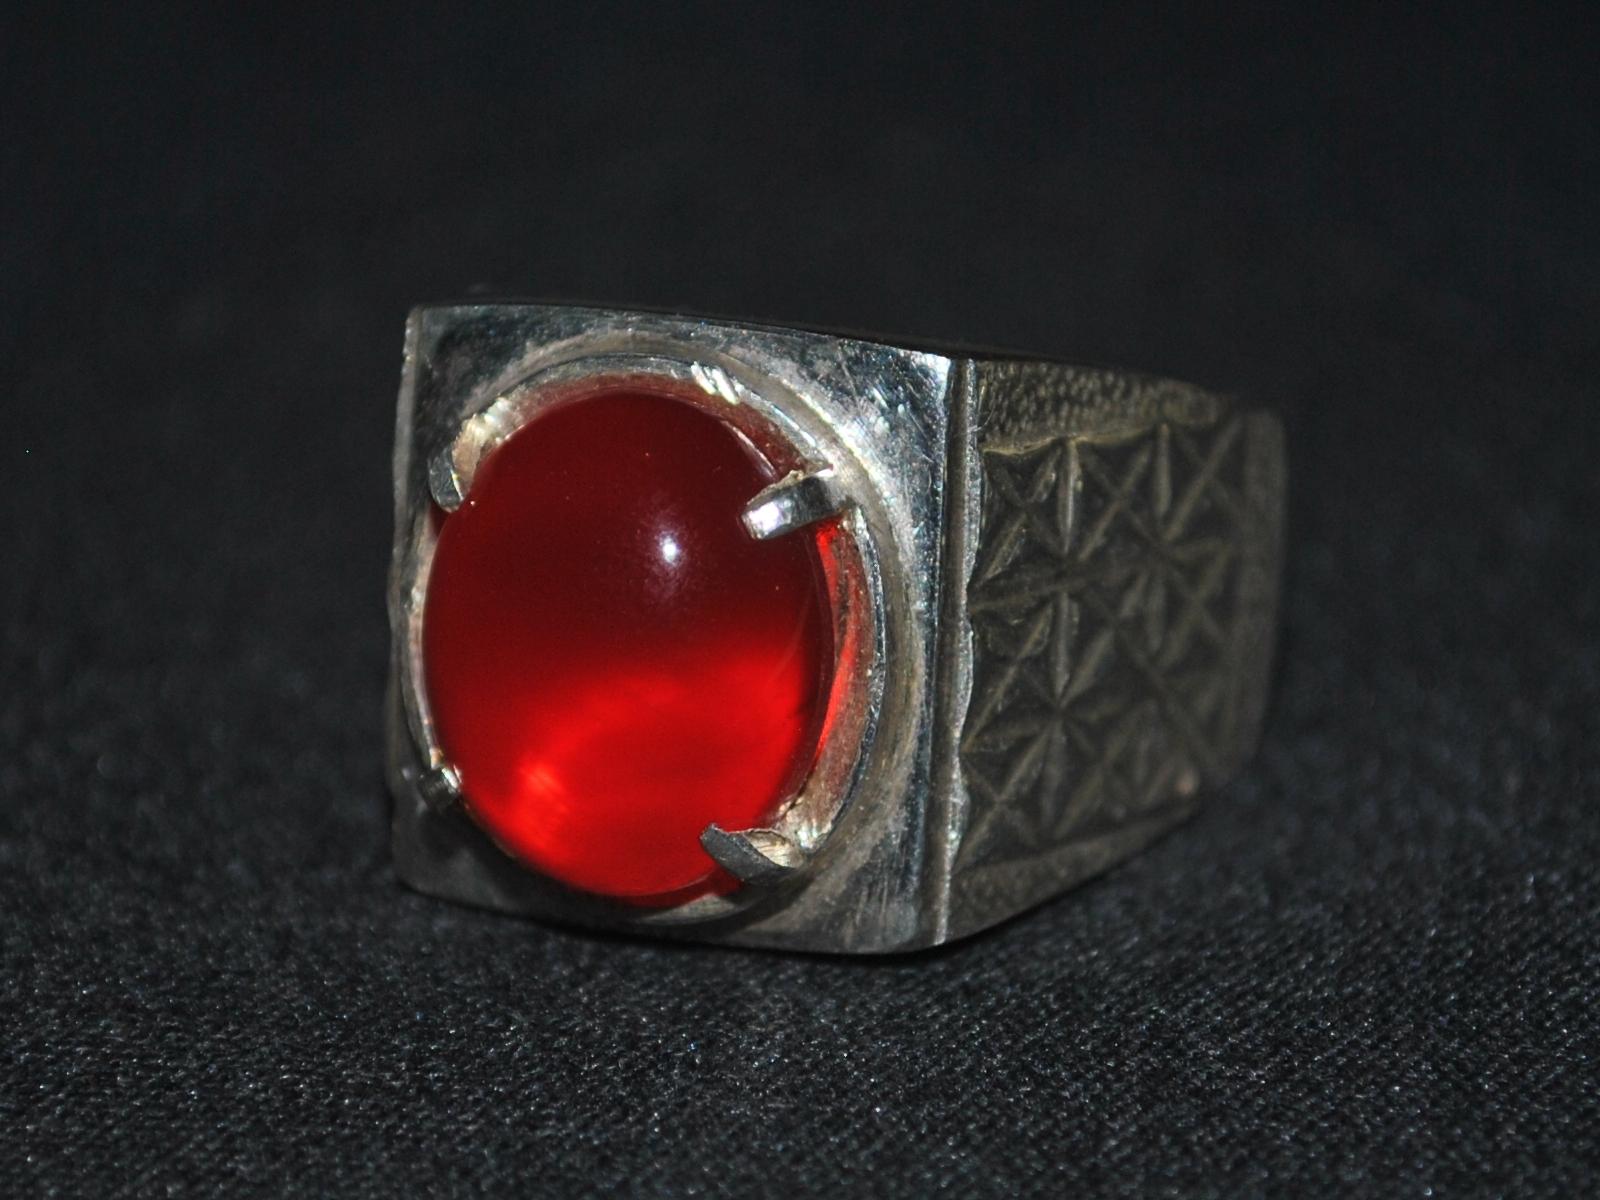 ... , warnanya benar-benar seperti darah segar. Tali cincin dari perak